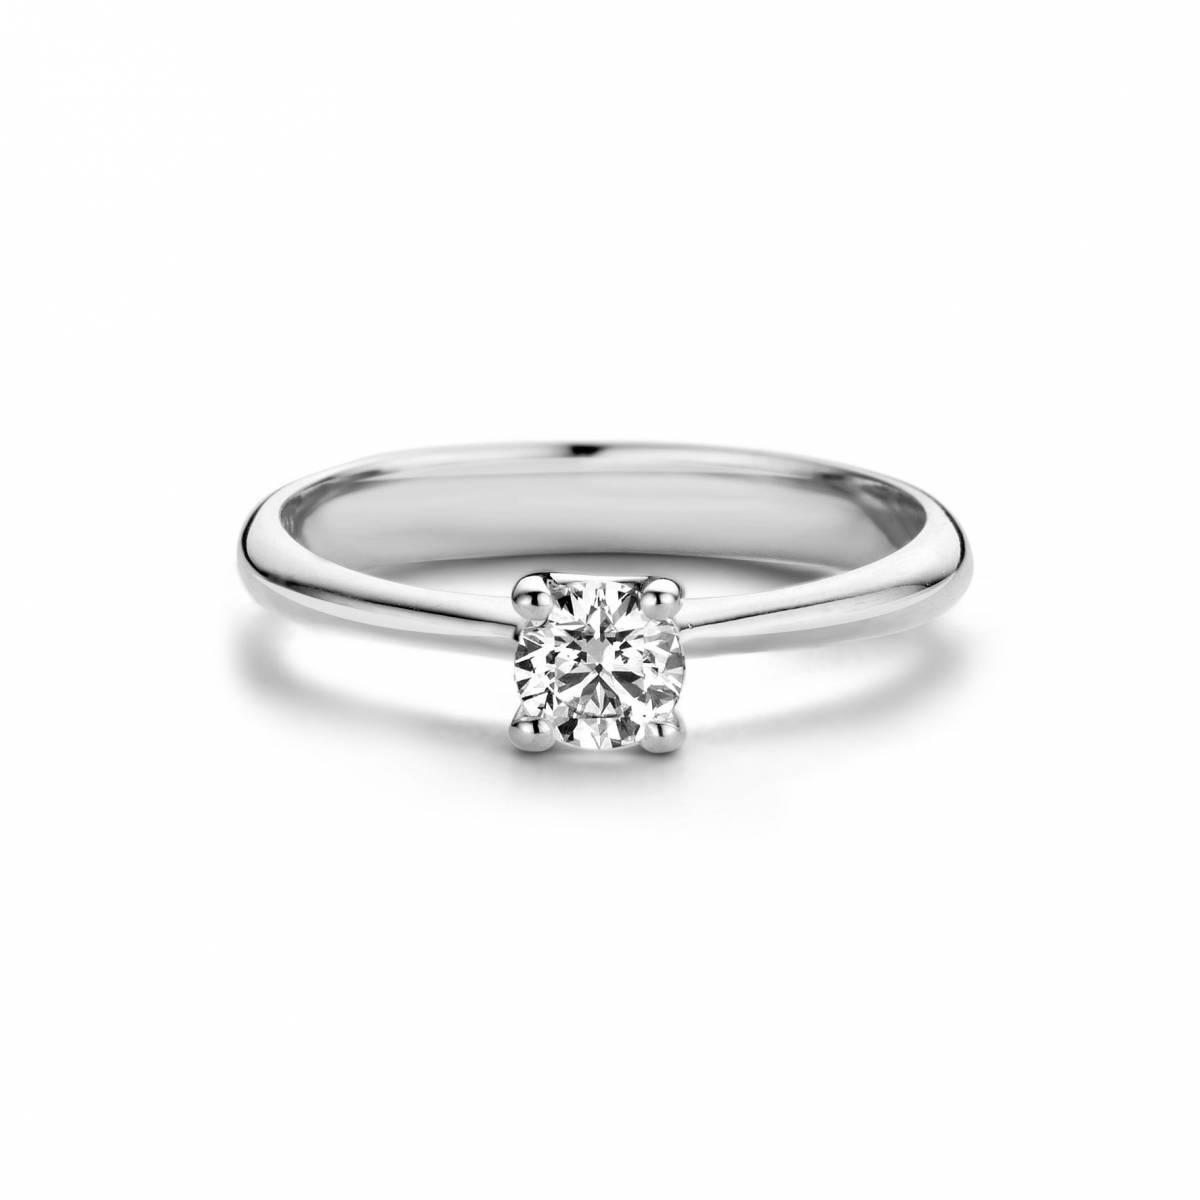 Juwelen Vanquaethem - House of Weddings (13)